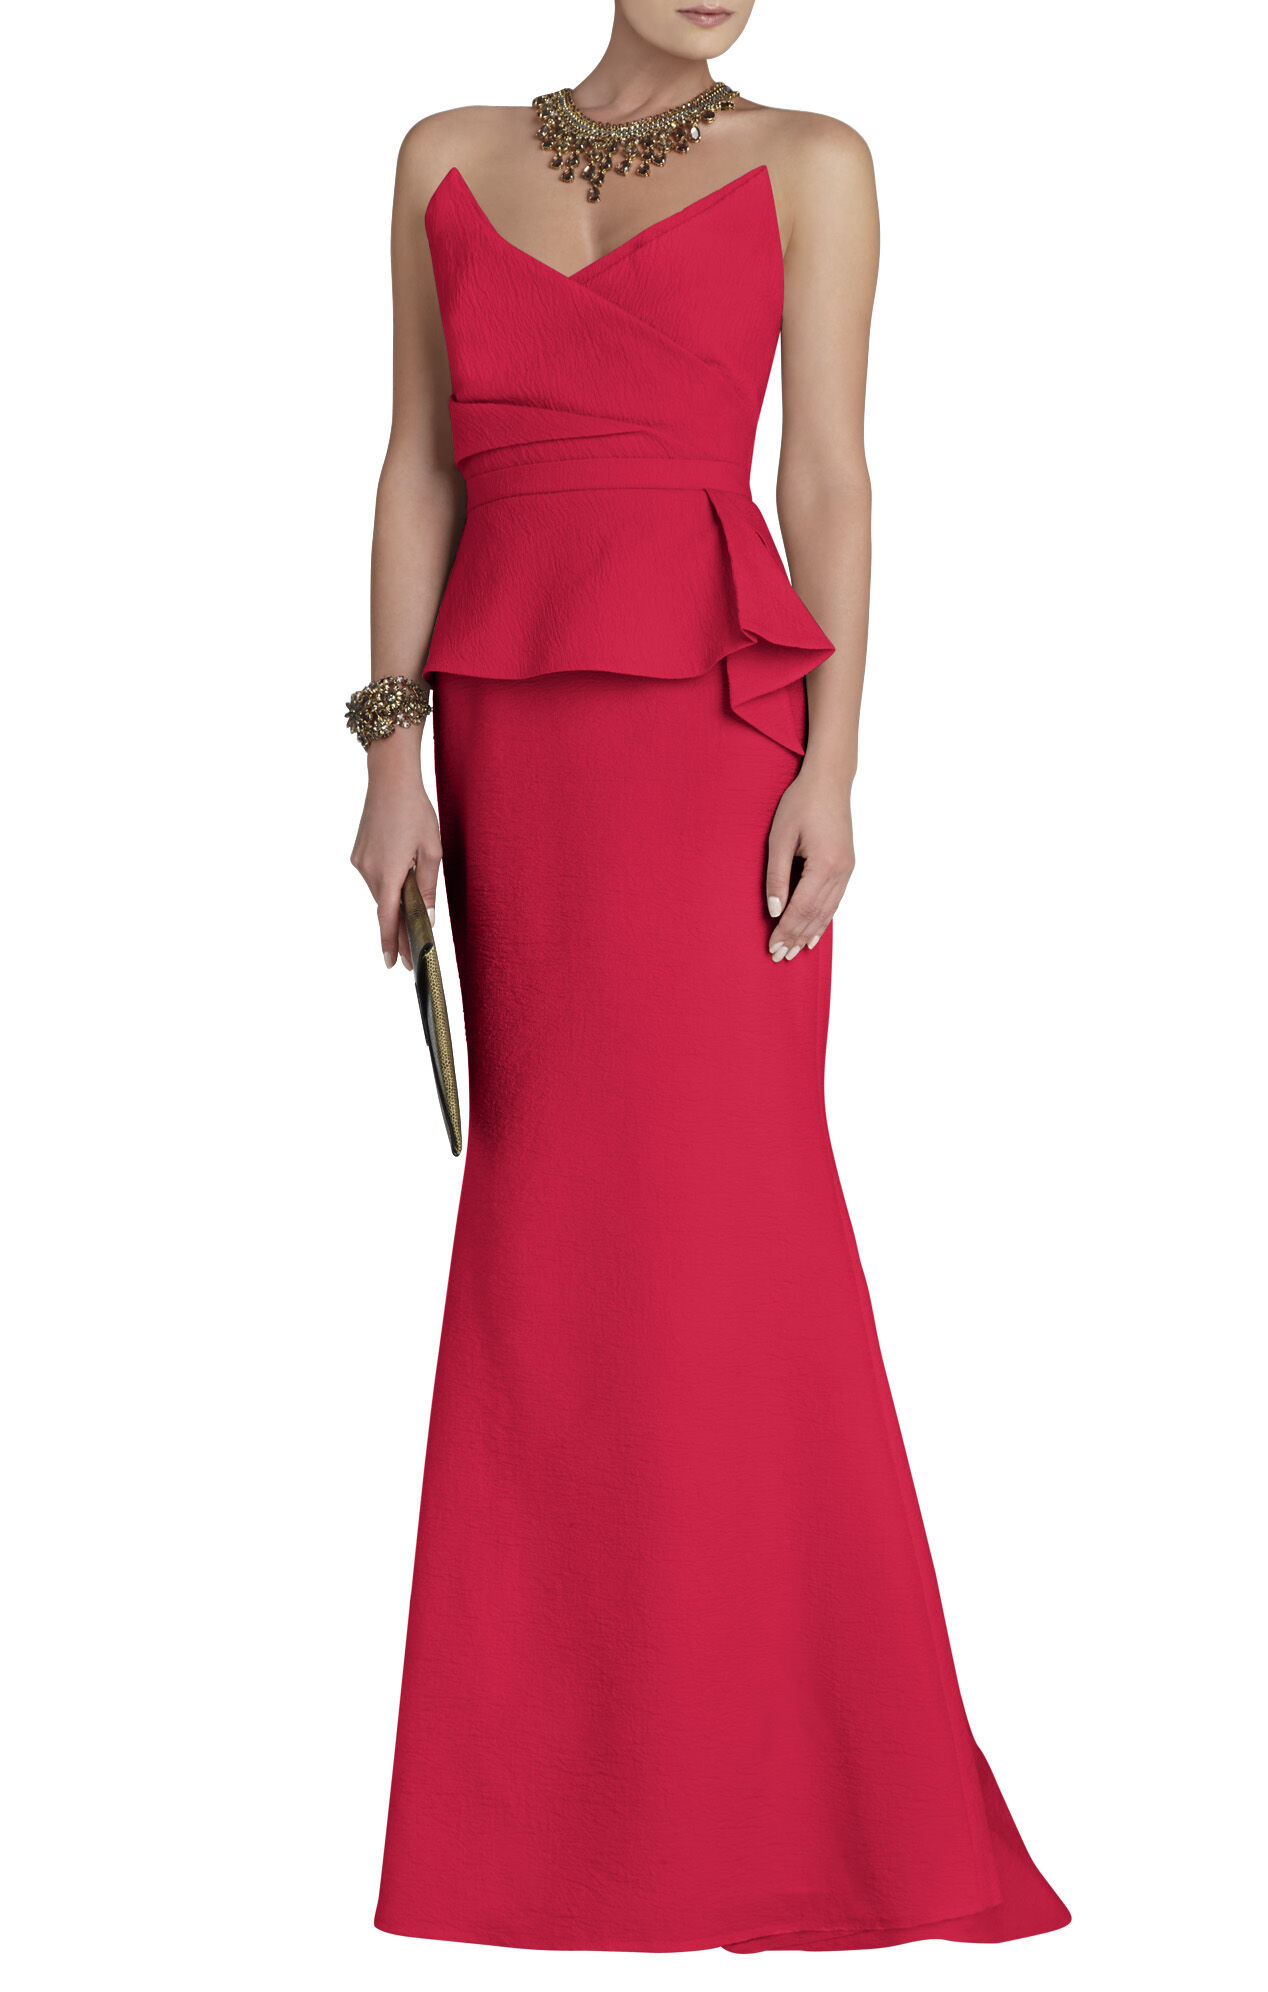 Gracie Gown Strapless Peplum